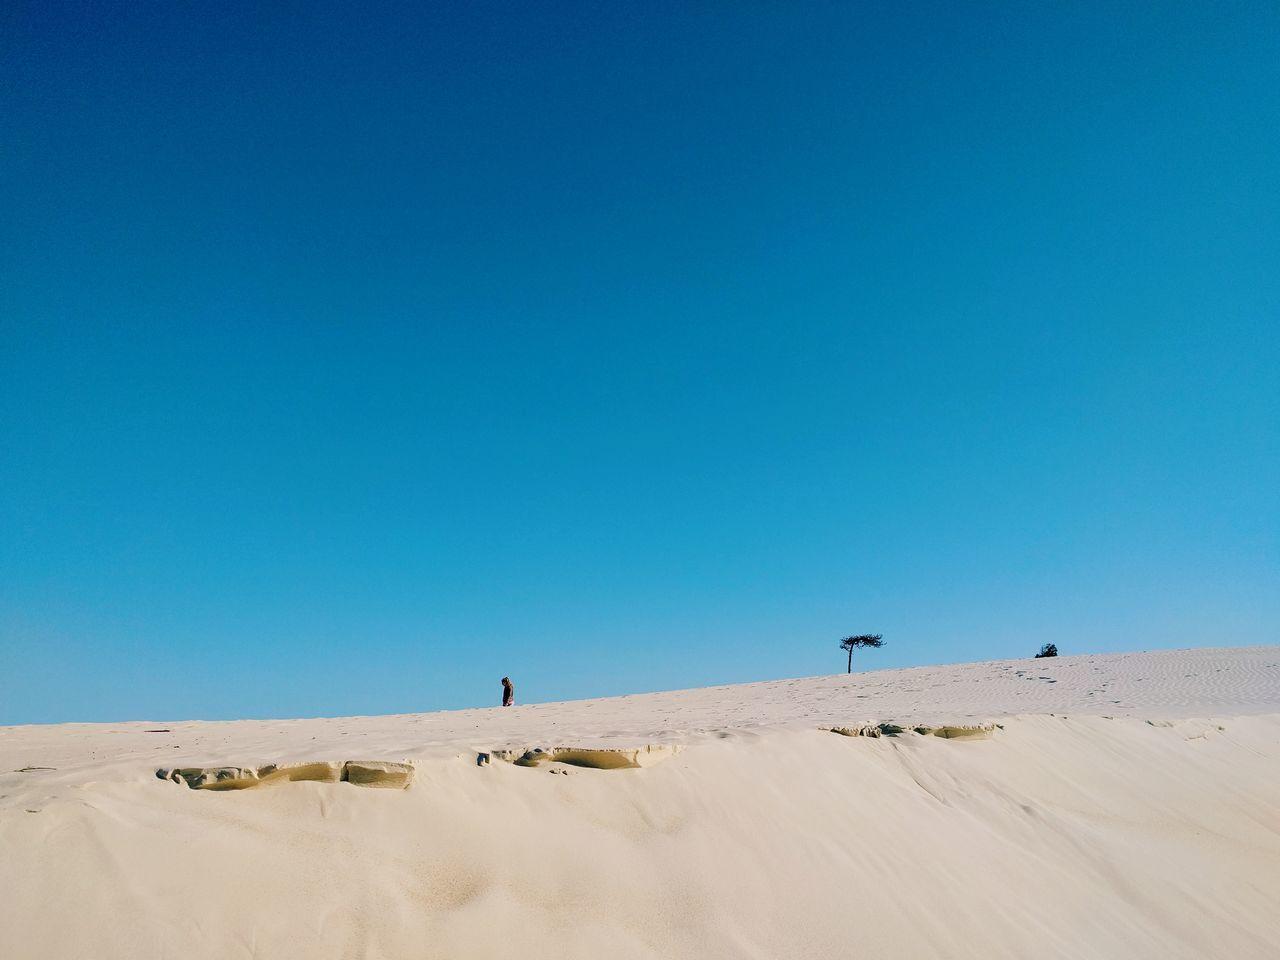 Horizonte de arena Sand Sunny Sand Dune Heat - Temperature Clear Sky Outdoors Travel Destinations Scenics Day Landscape Sky Nature Blue Foto Photo Tranquil Scene